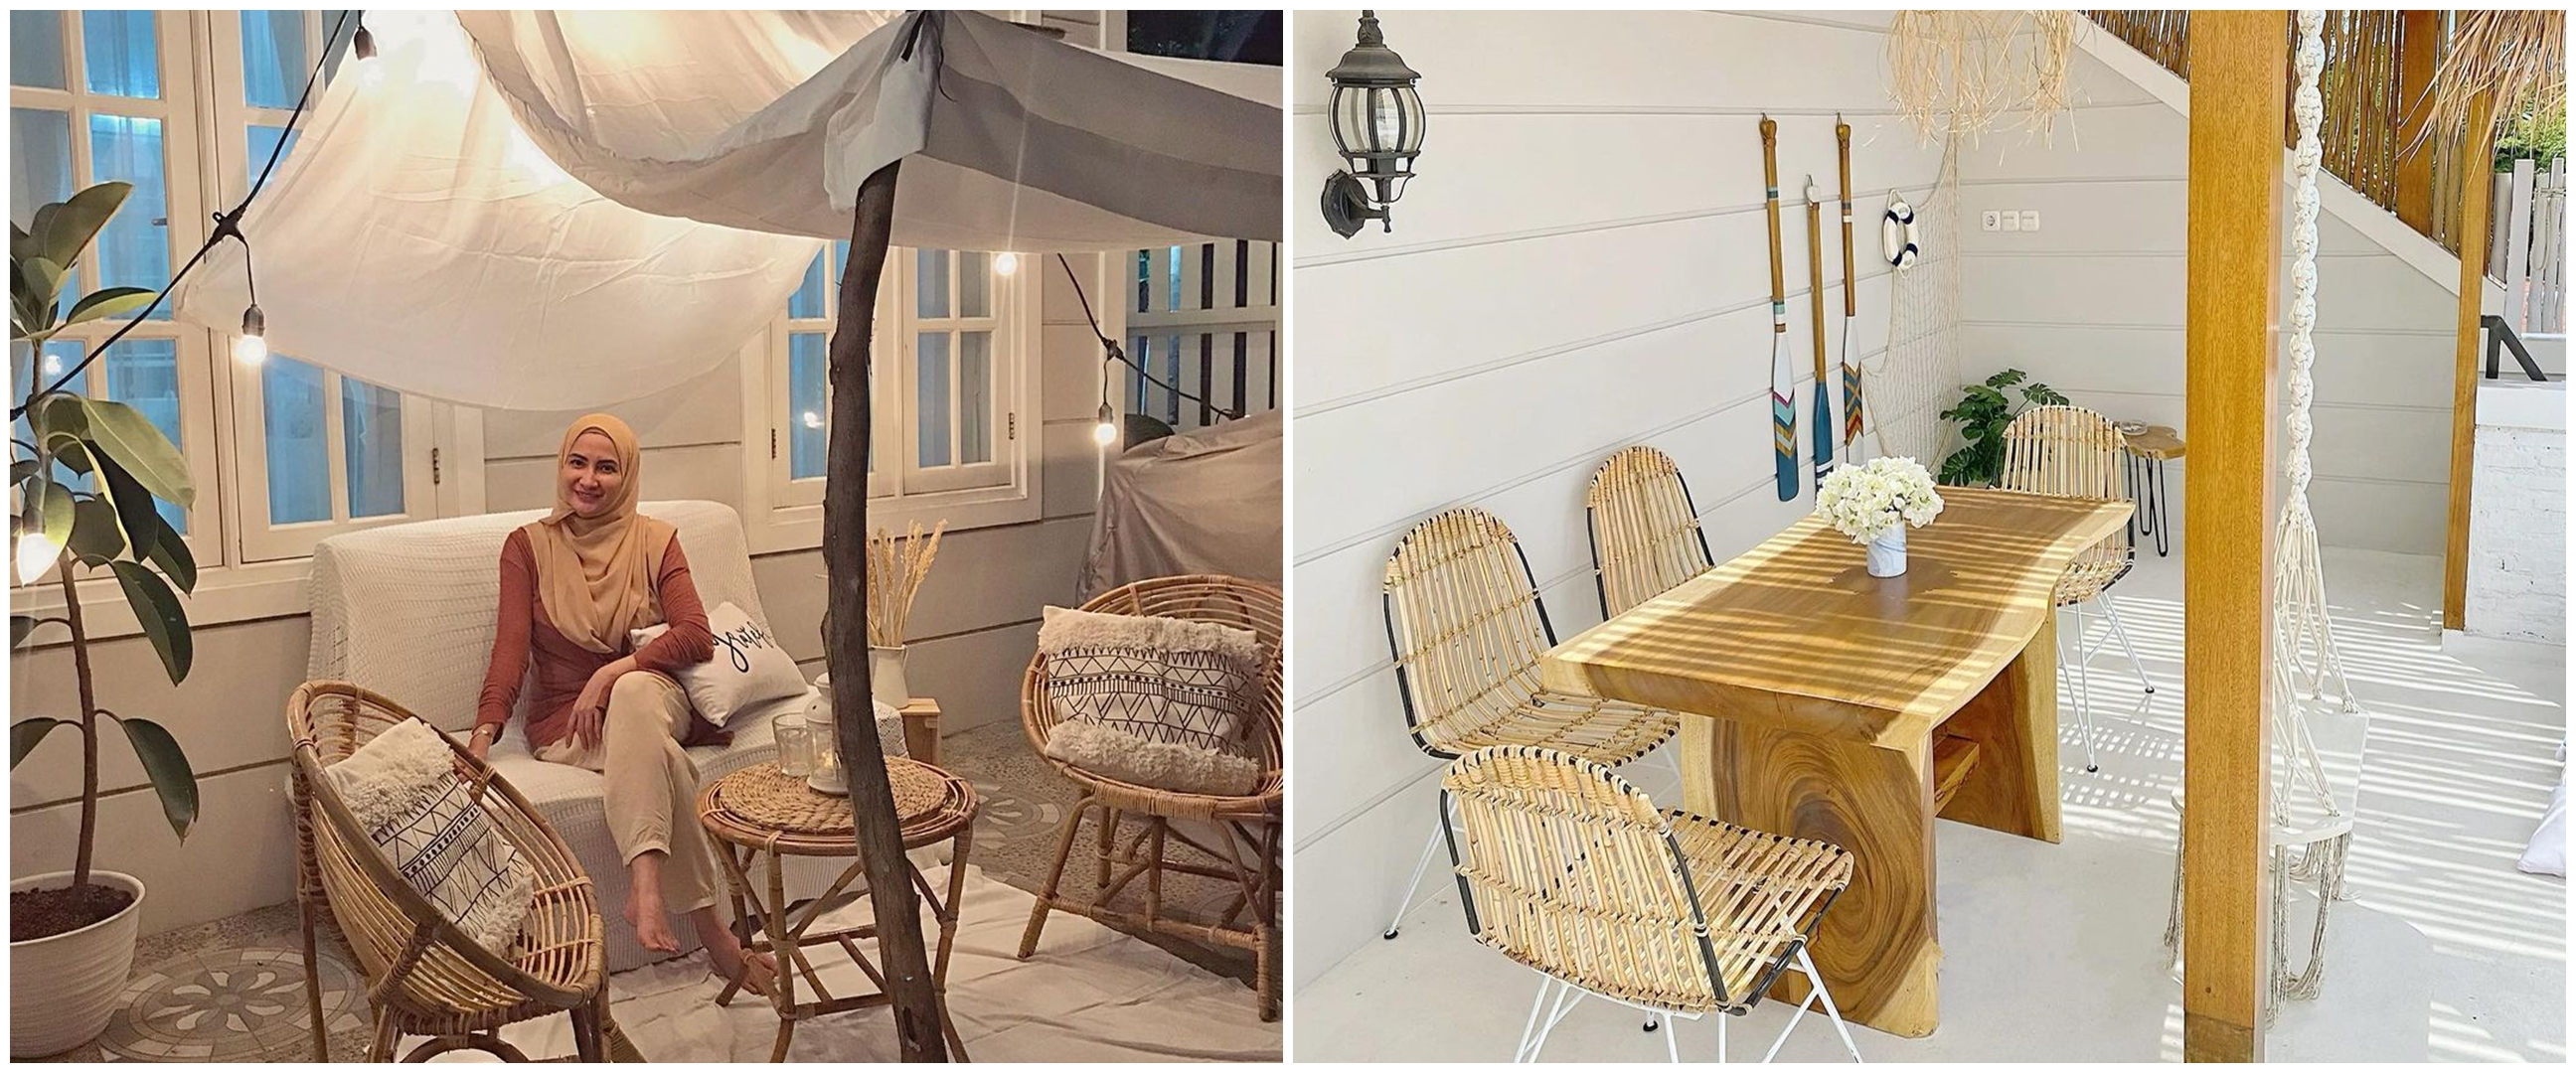 10 Potret area outdoor rumah Natalie Sarah, setiap sudut Instagramable